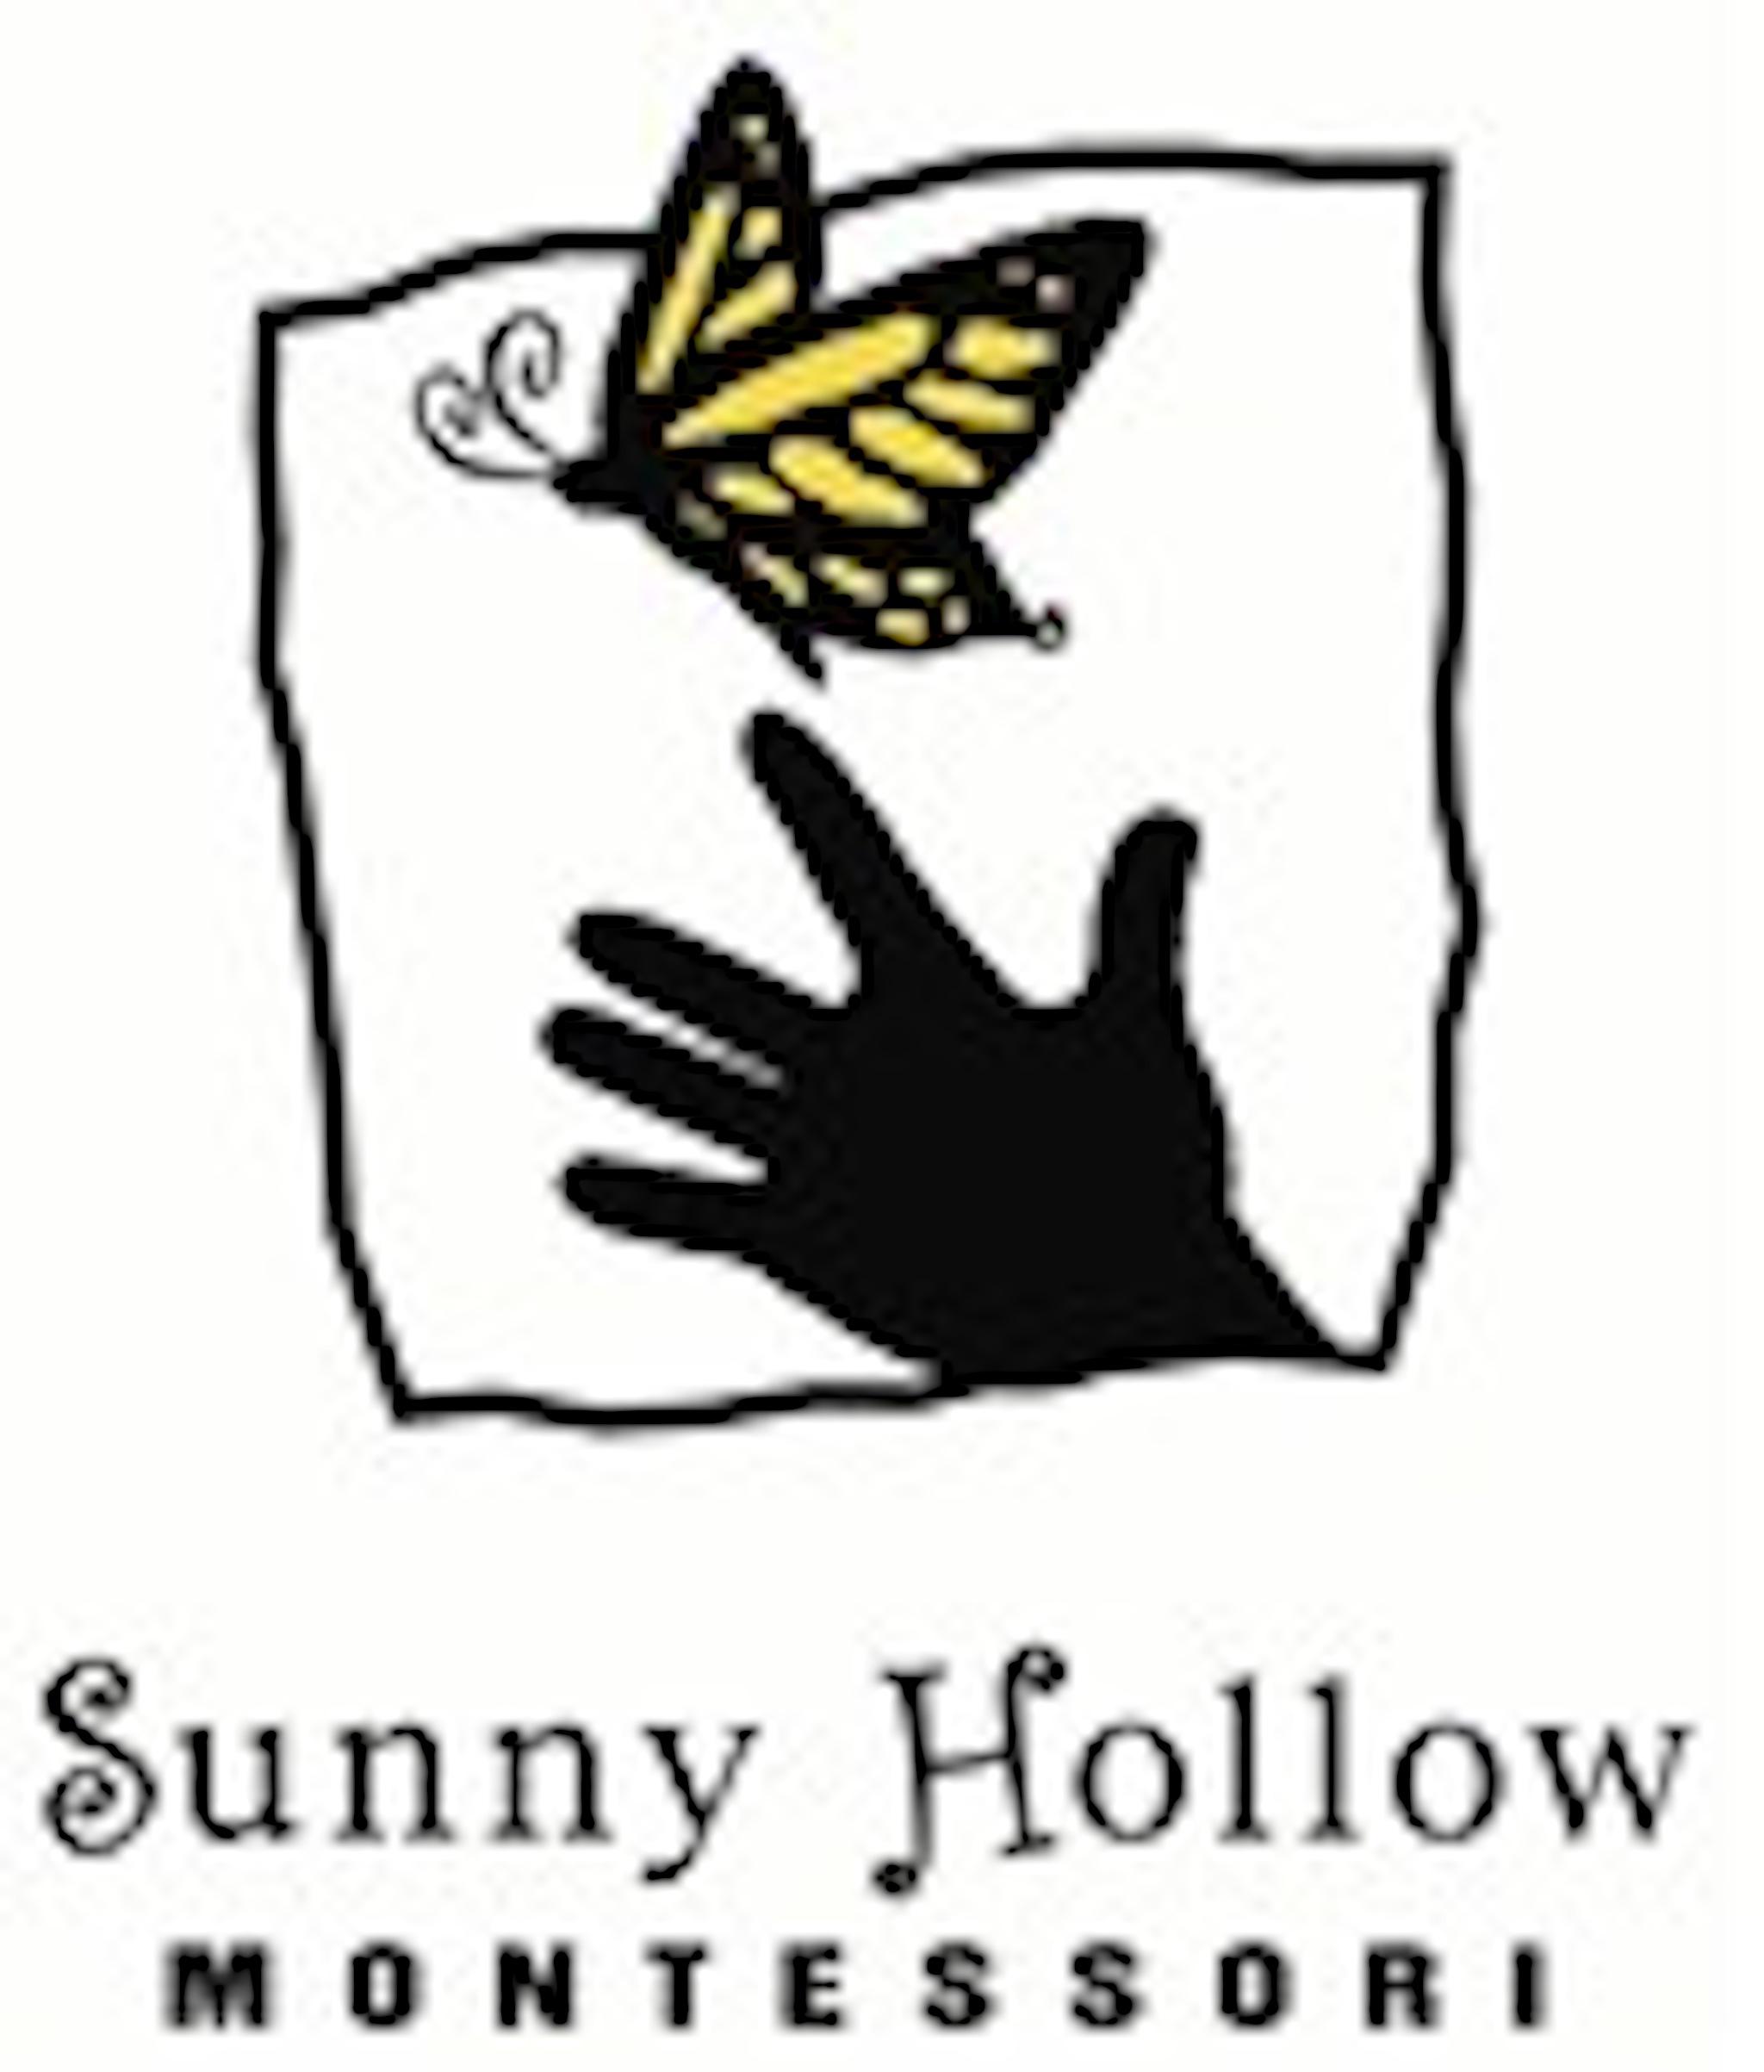 Sunny Hollow Montessori